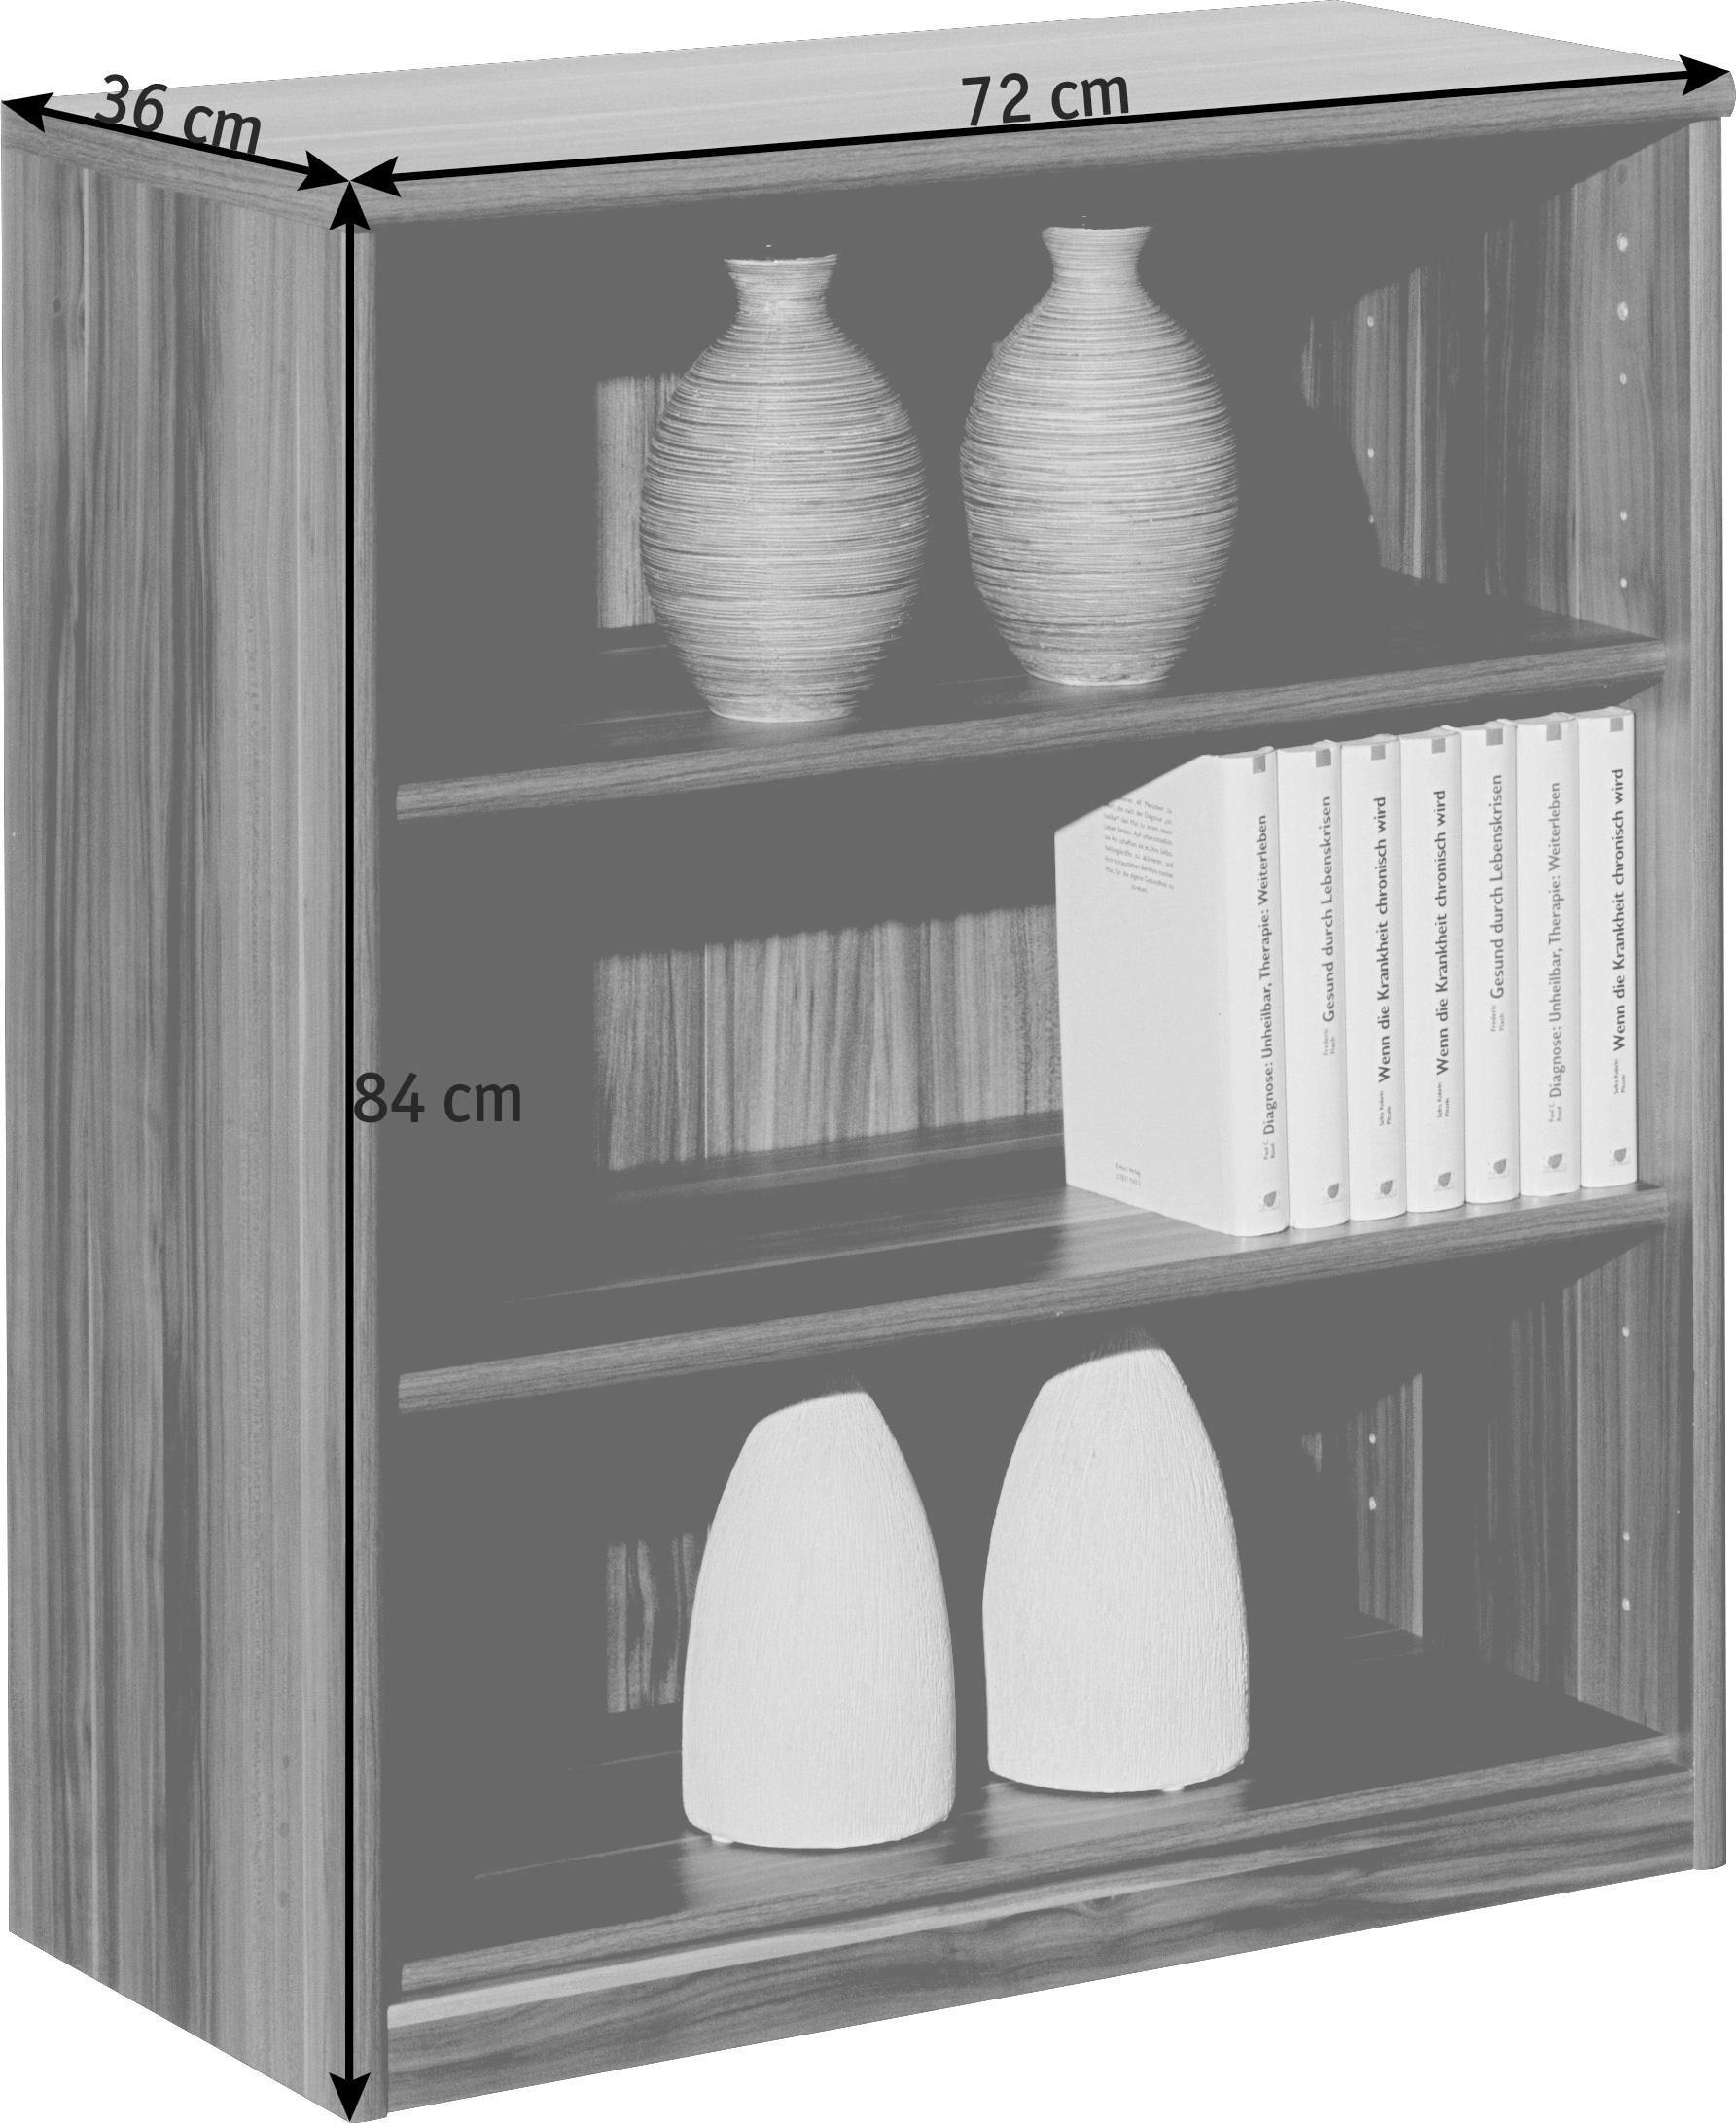 REGAL - bijela, Konvencionalno, drvni materijal (72/84/36cm) - CS SCHMAL